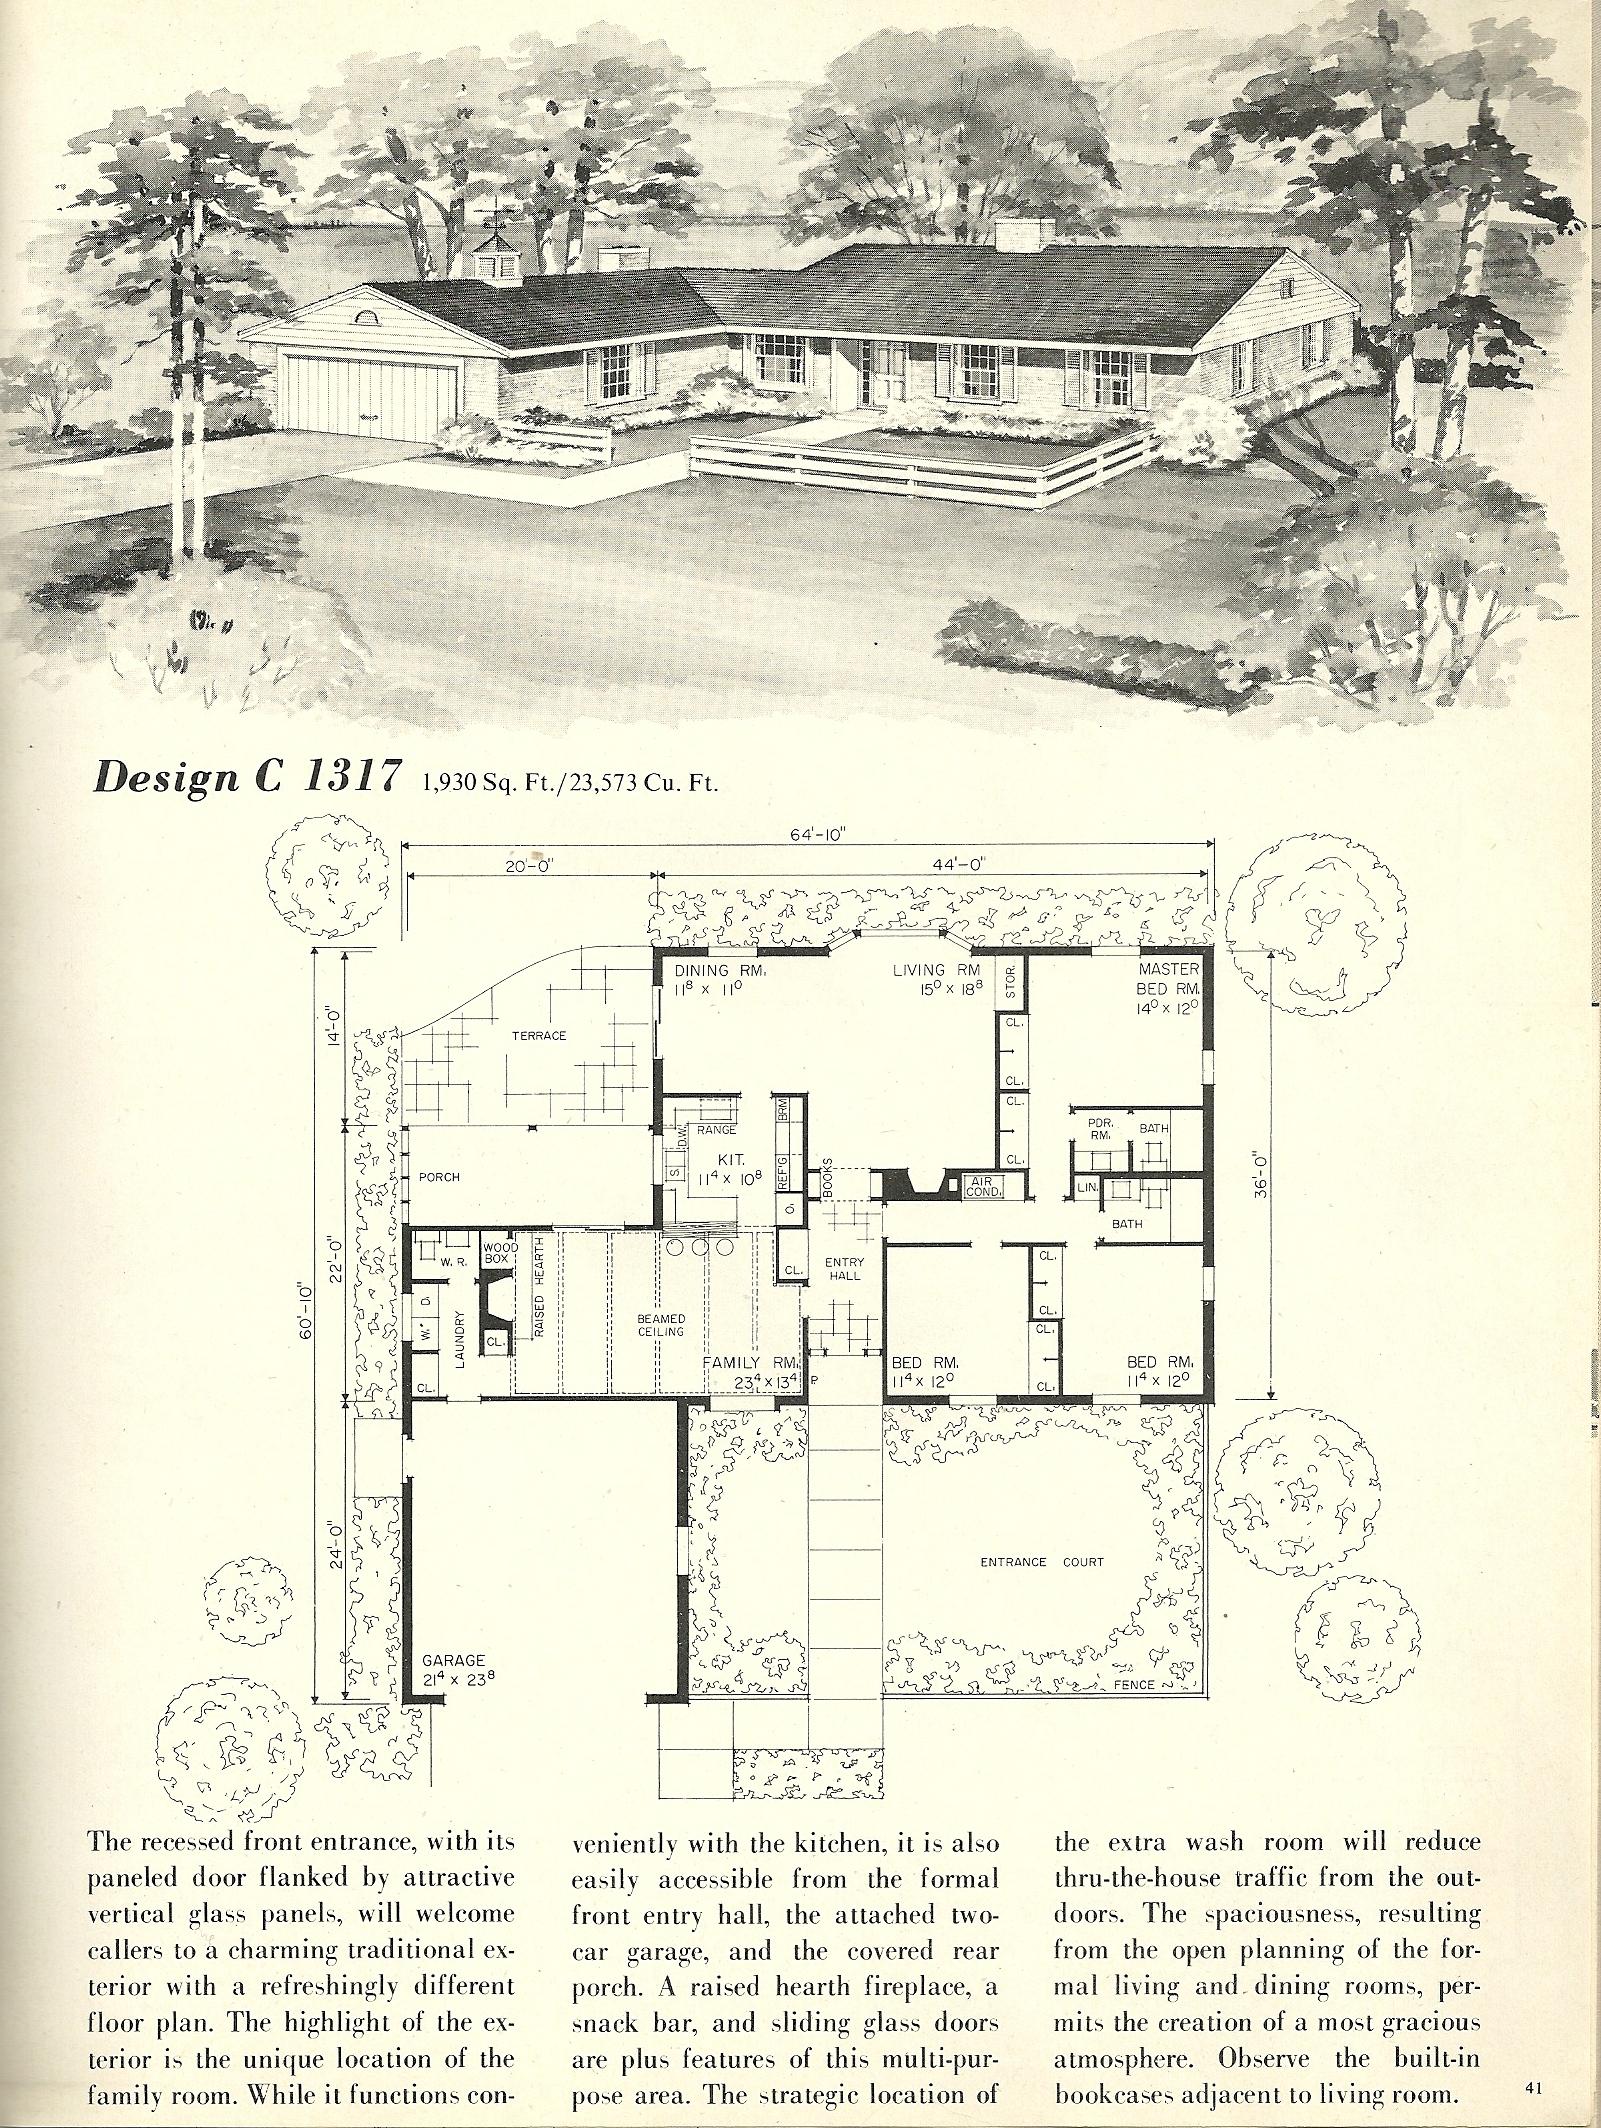 Vintage House Plans 1317 Antique Alter Ego